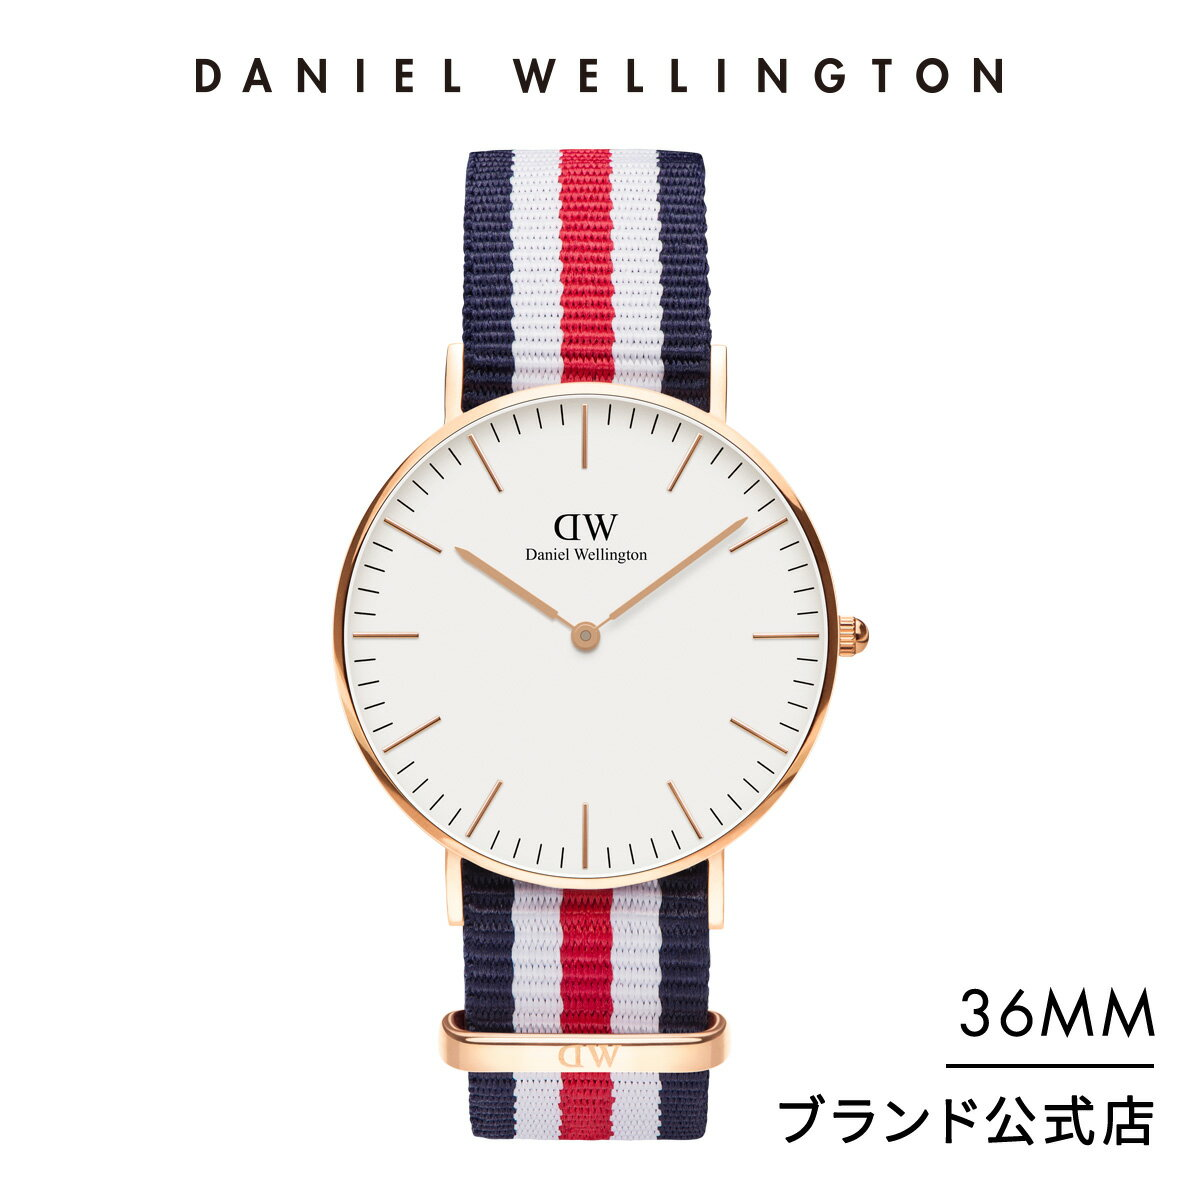 DANIELWELLINGTON(ダニエルウェリントン)『CLASSICCANTERBURY(DW00100030)』